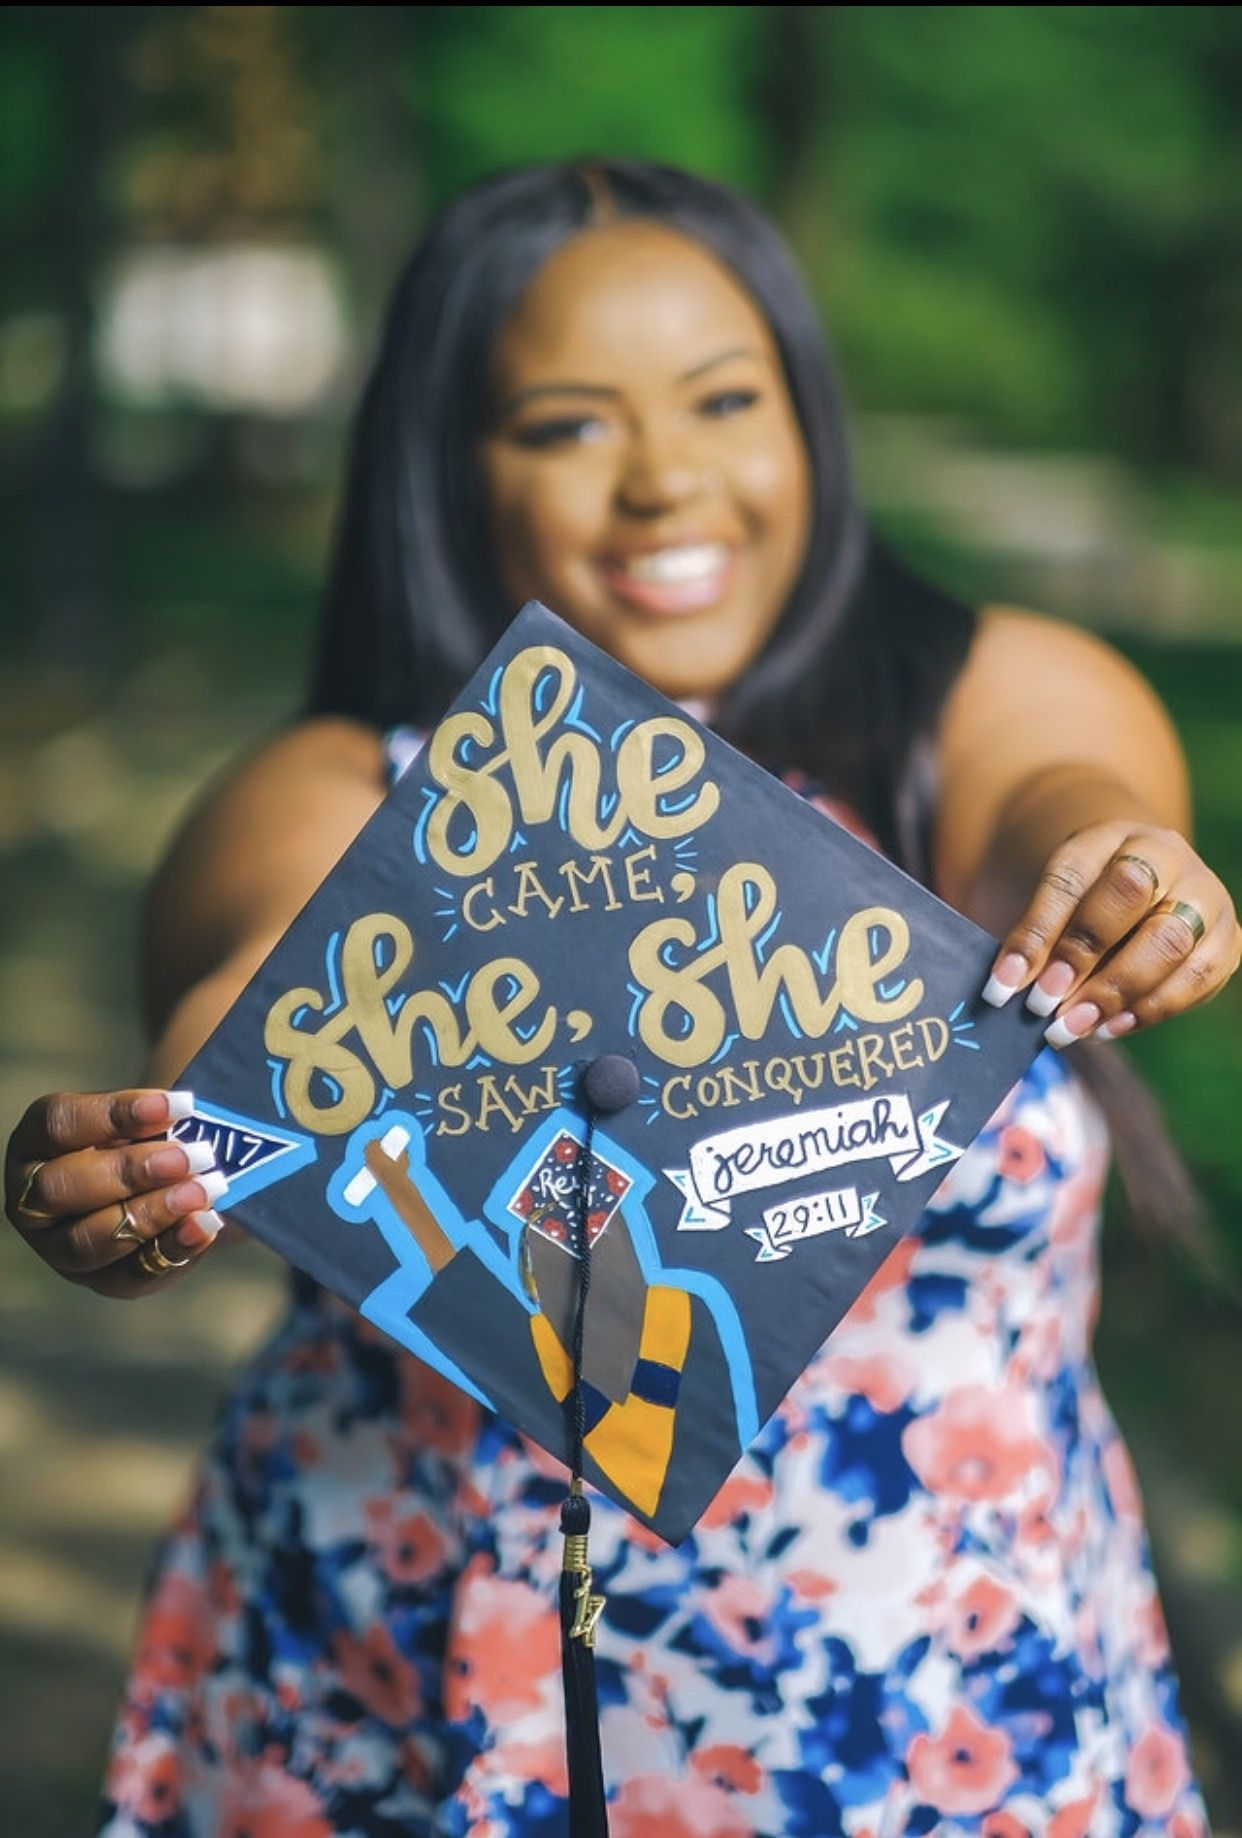 , Graduation cap she came, she saw, she conquered, Anja Rubik Blog, Anja Rubik Blog